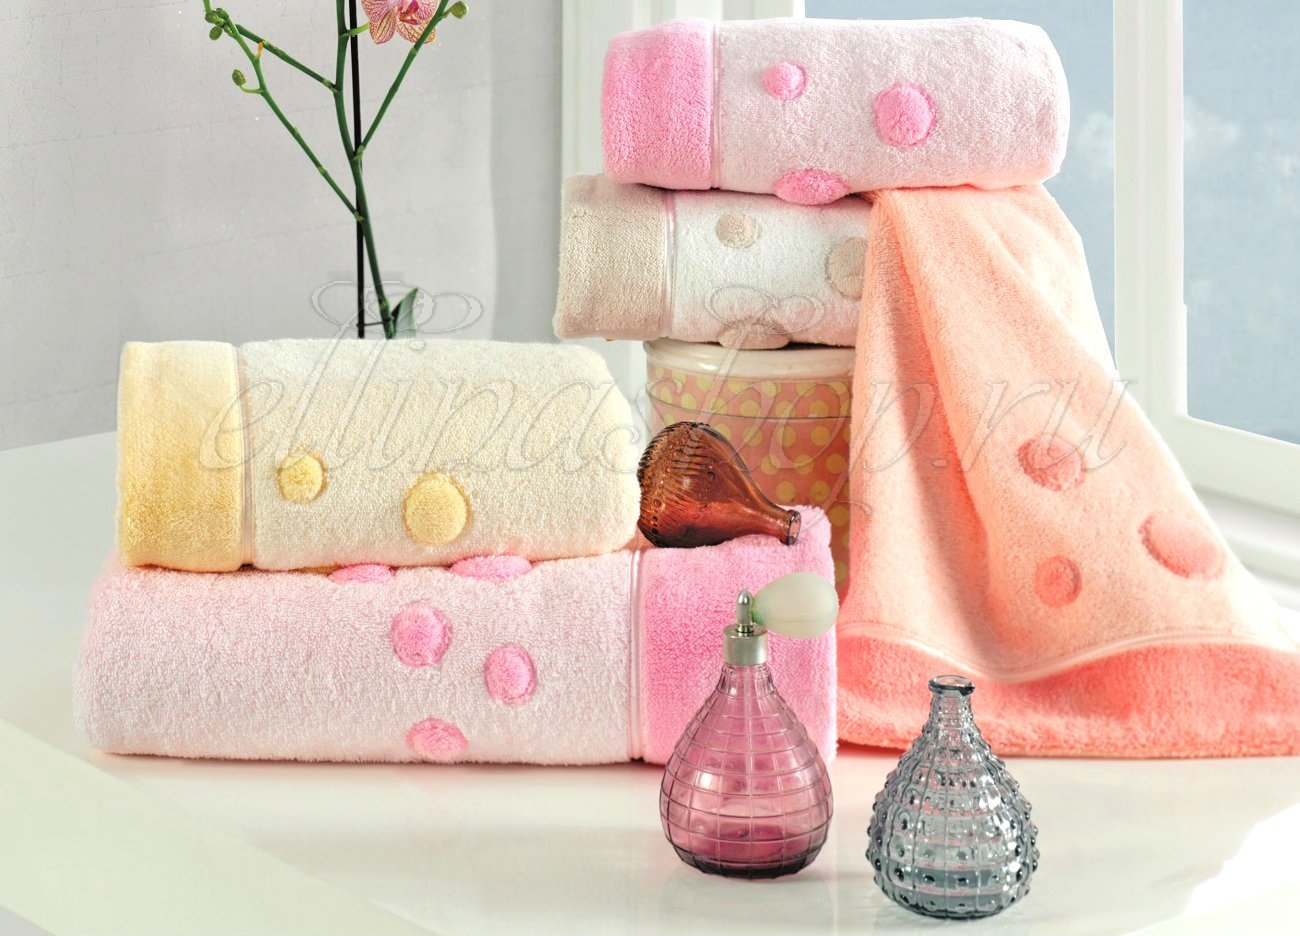 Puffy махровое полотенце Soft Cotton